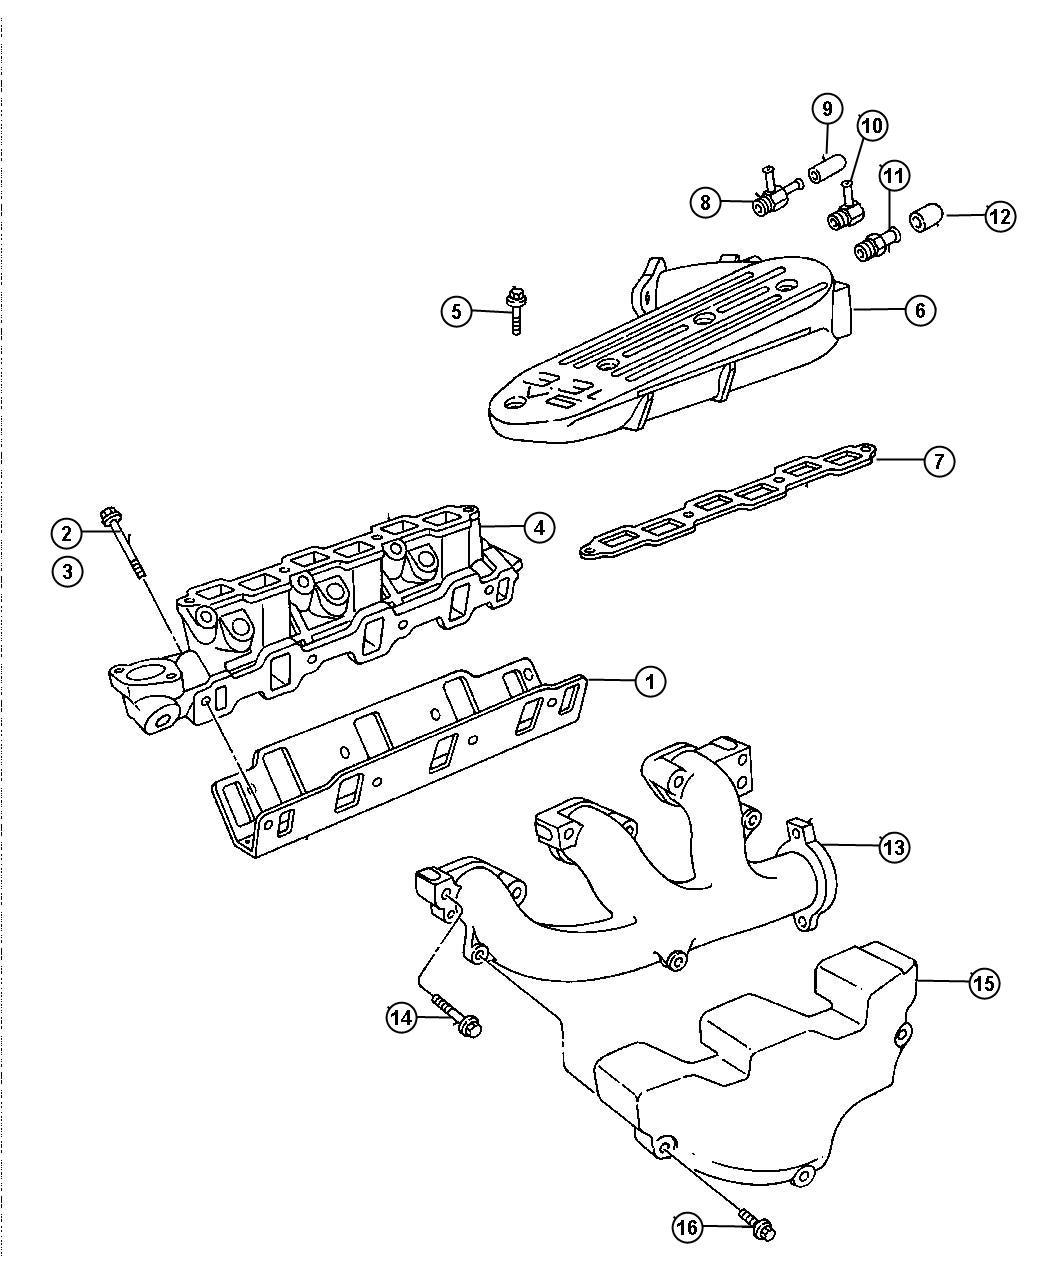 jeep cherokee parts catalogs